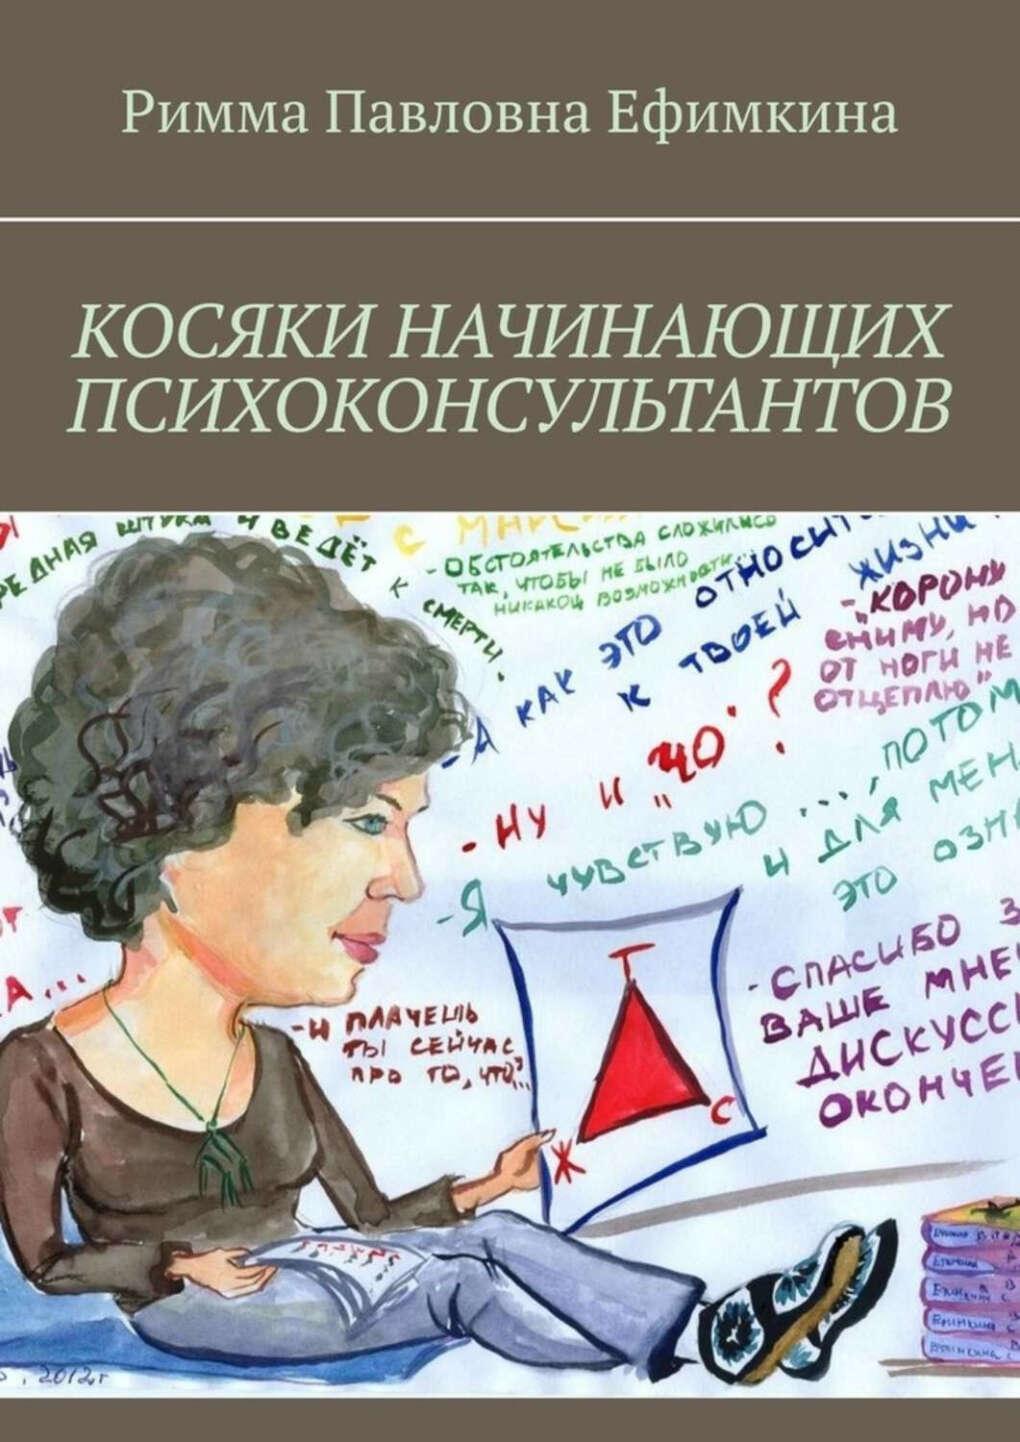 Косяки начинающих психоконсультантов – Римма Павловна Ефимкина